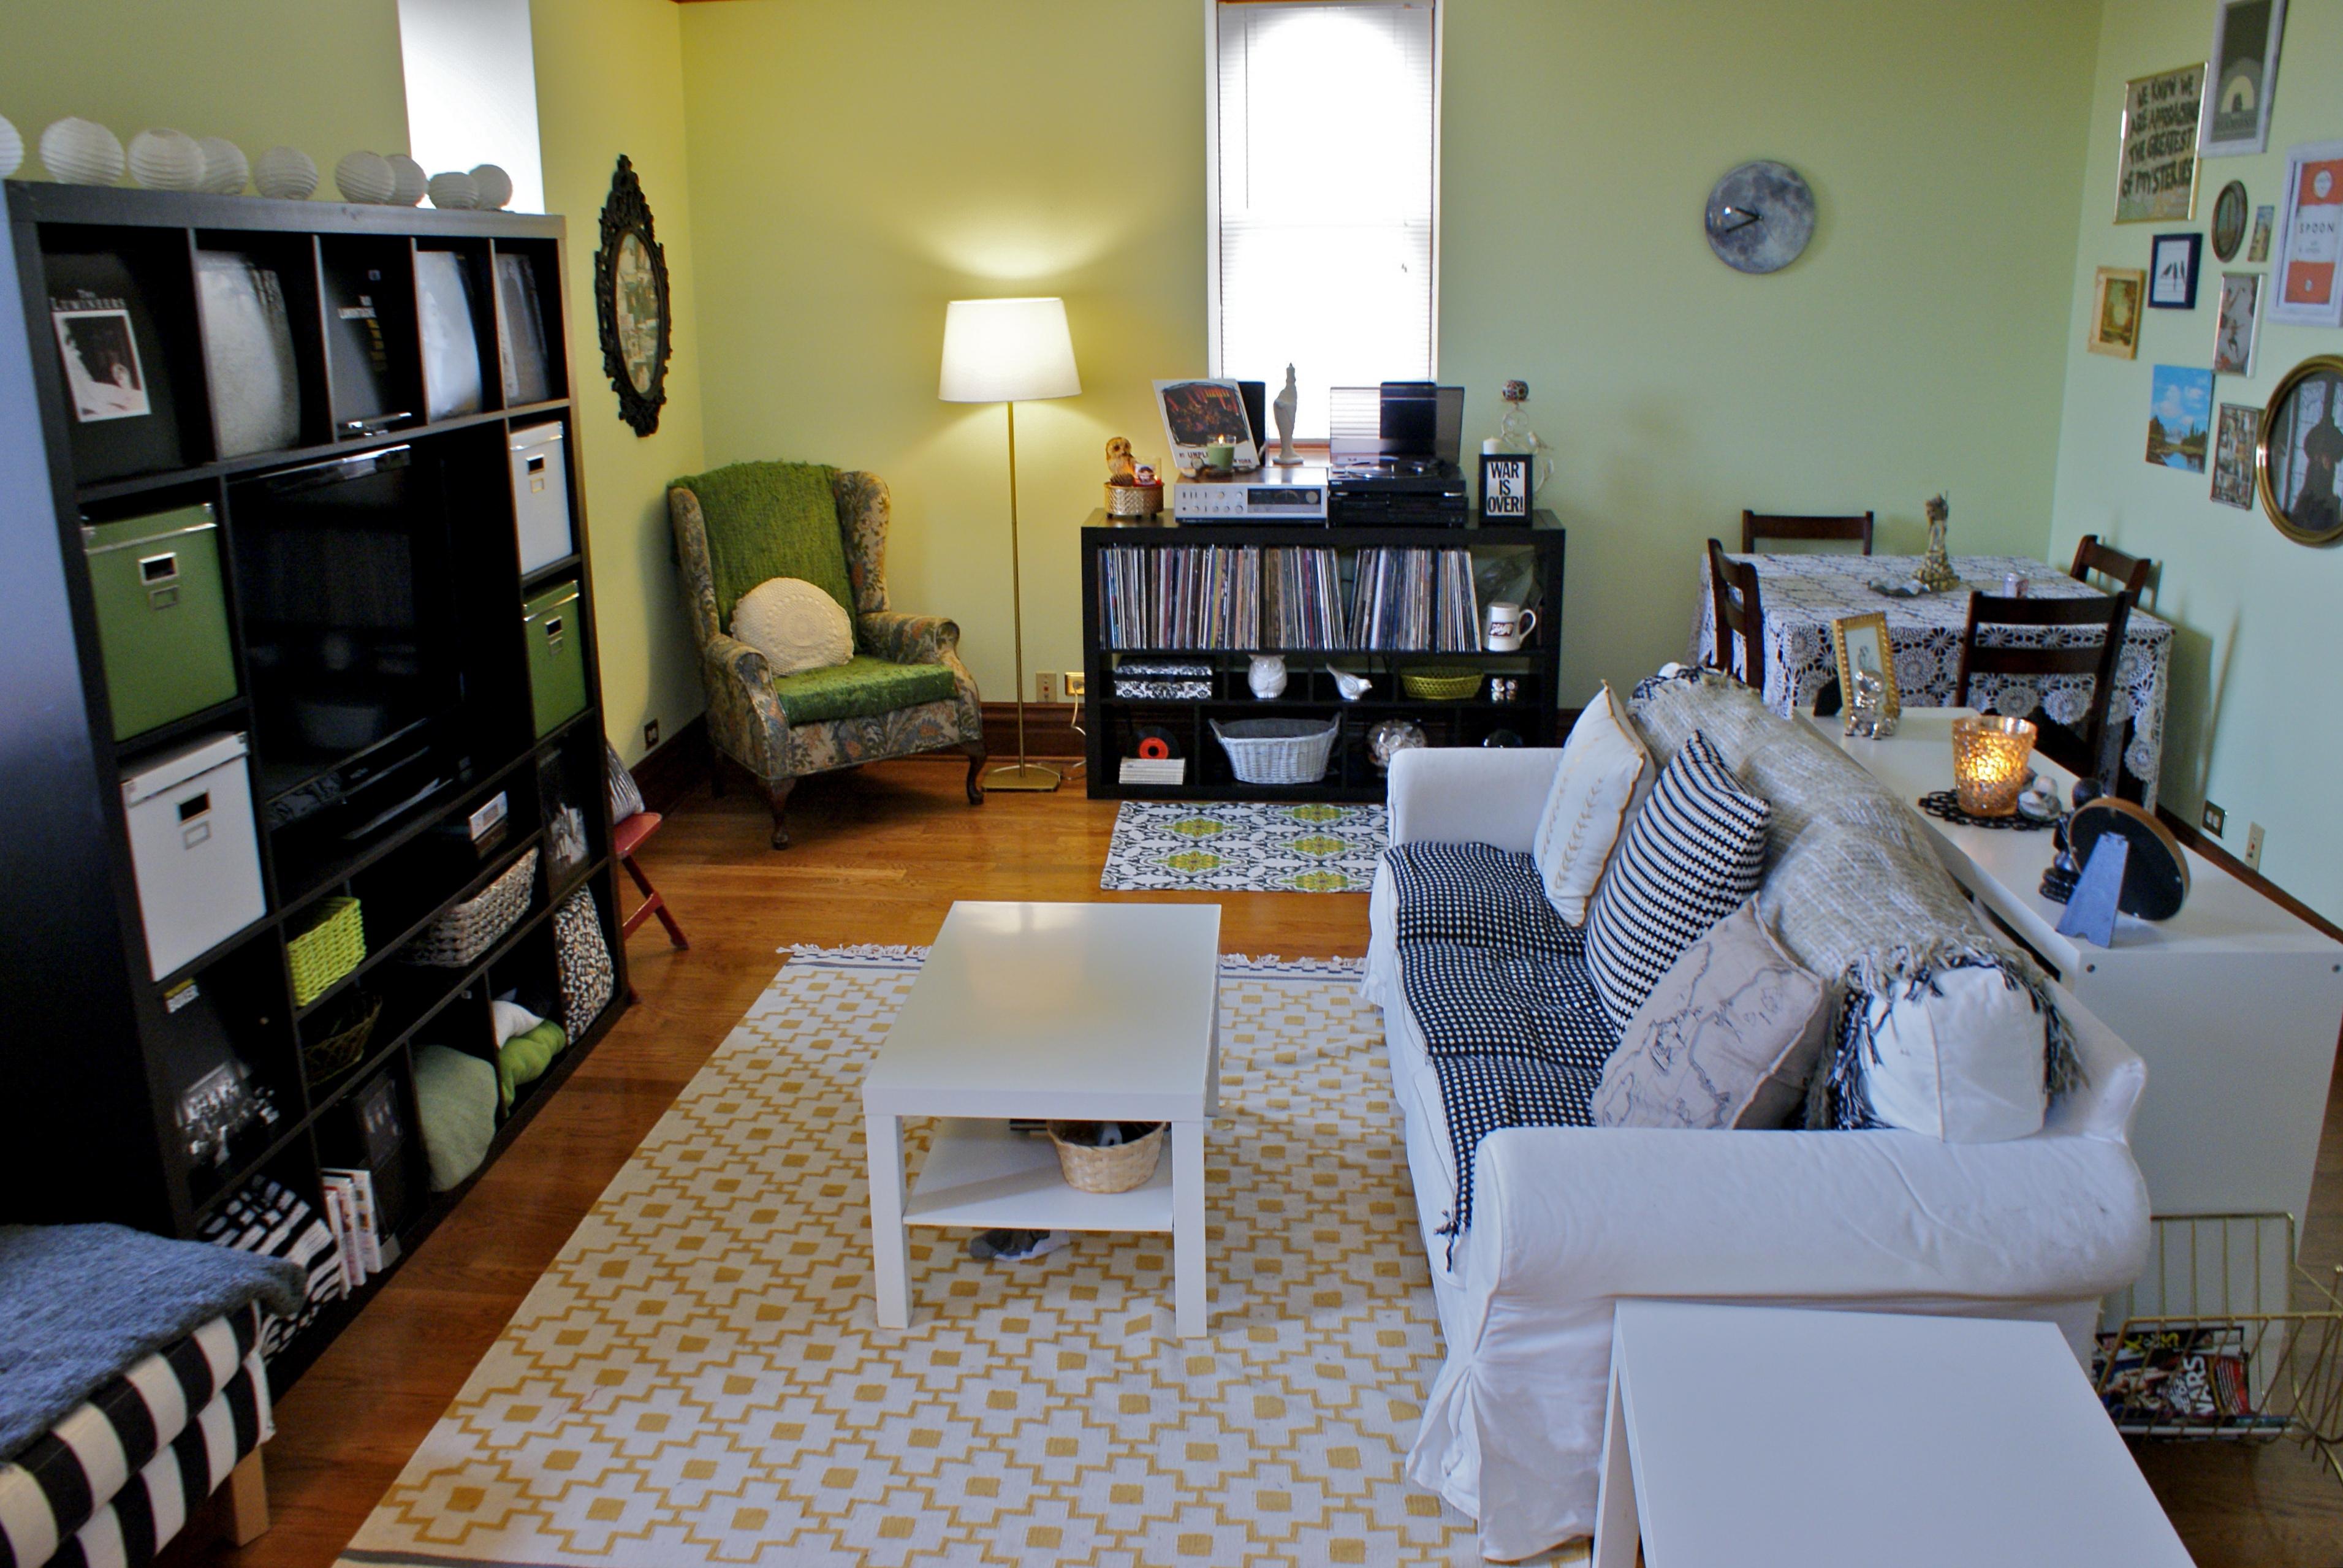 Apartment Living  Living Room Tour  CHRONIC ENTHUSIASM